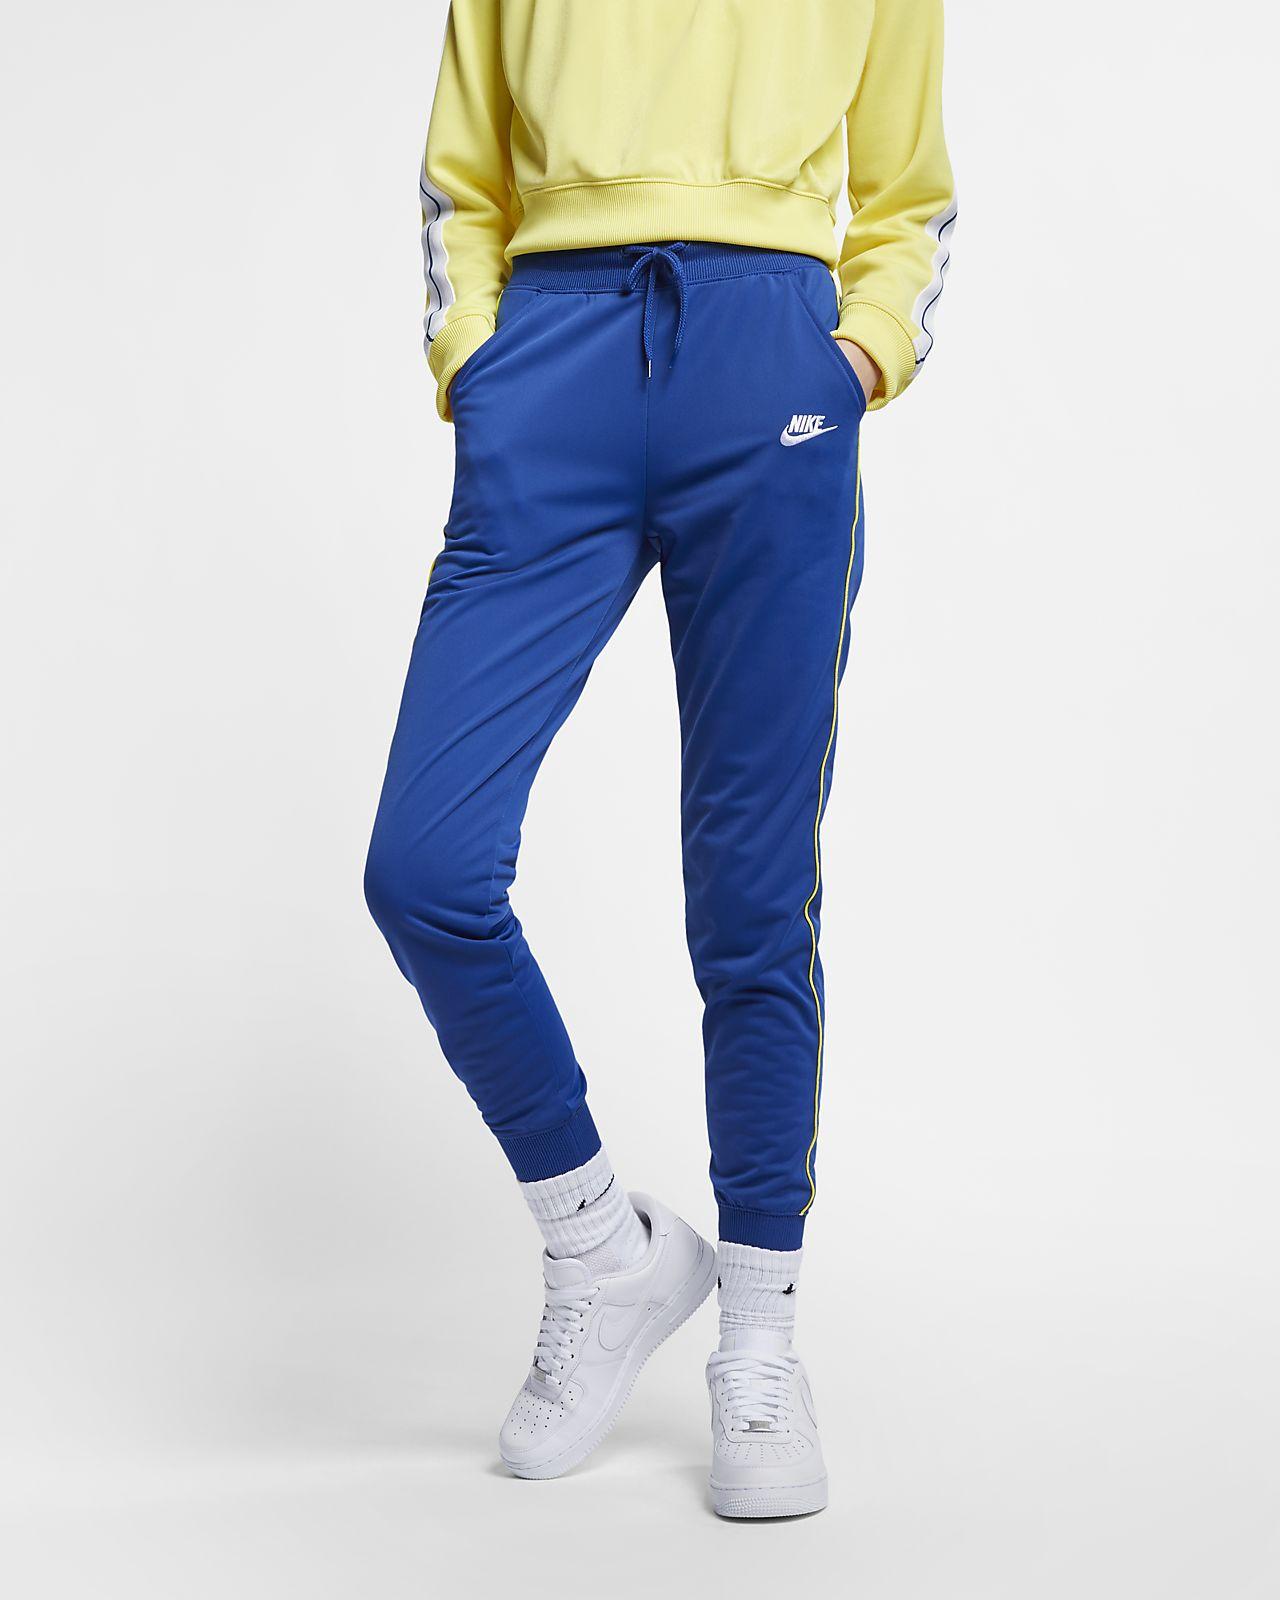 289c836c3e990 Pantalon de jogging Nike Sportswear Heritage pour Femme. Nike.com FR